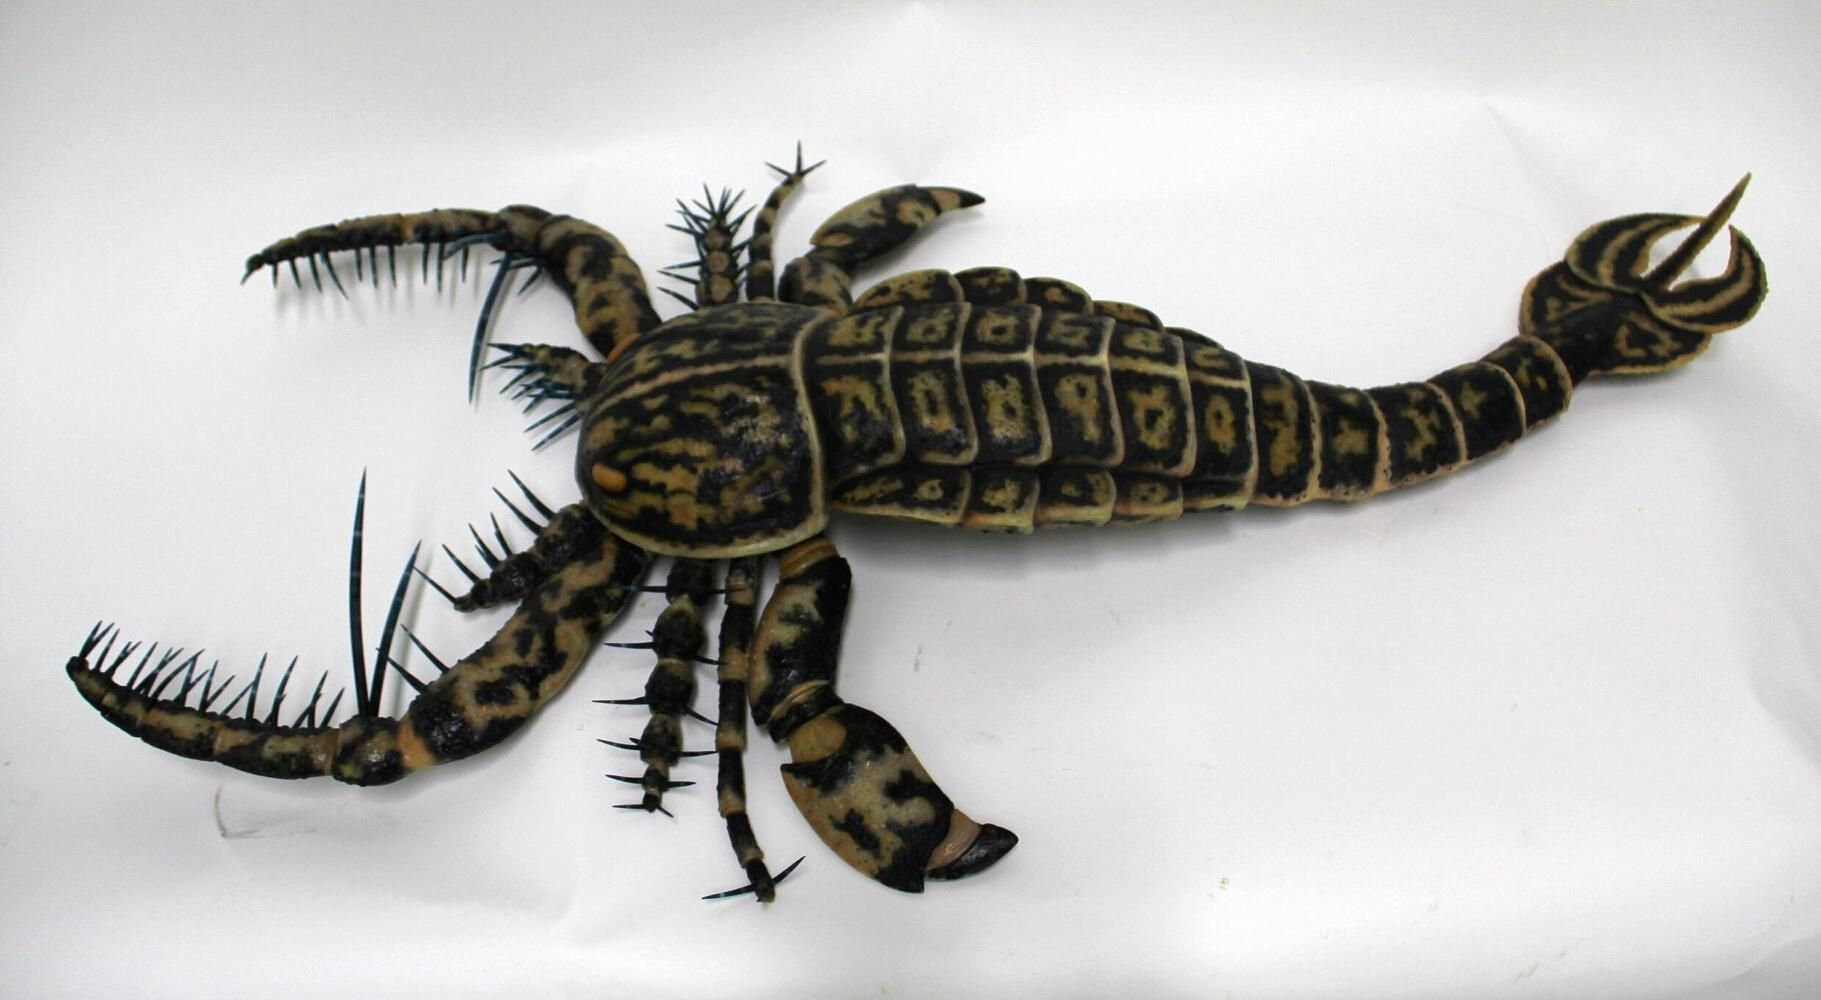 Eurypteridn extinct marine arthropod of a group occurring